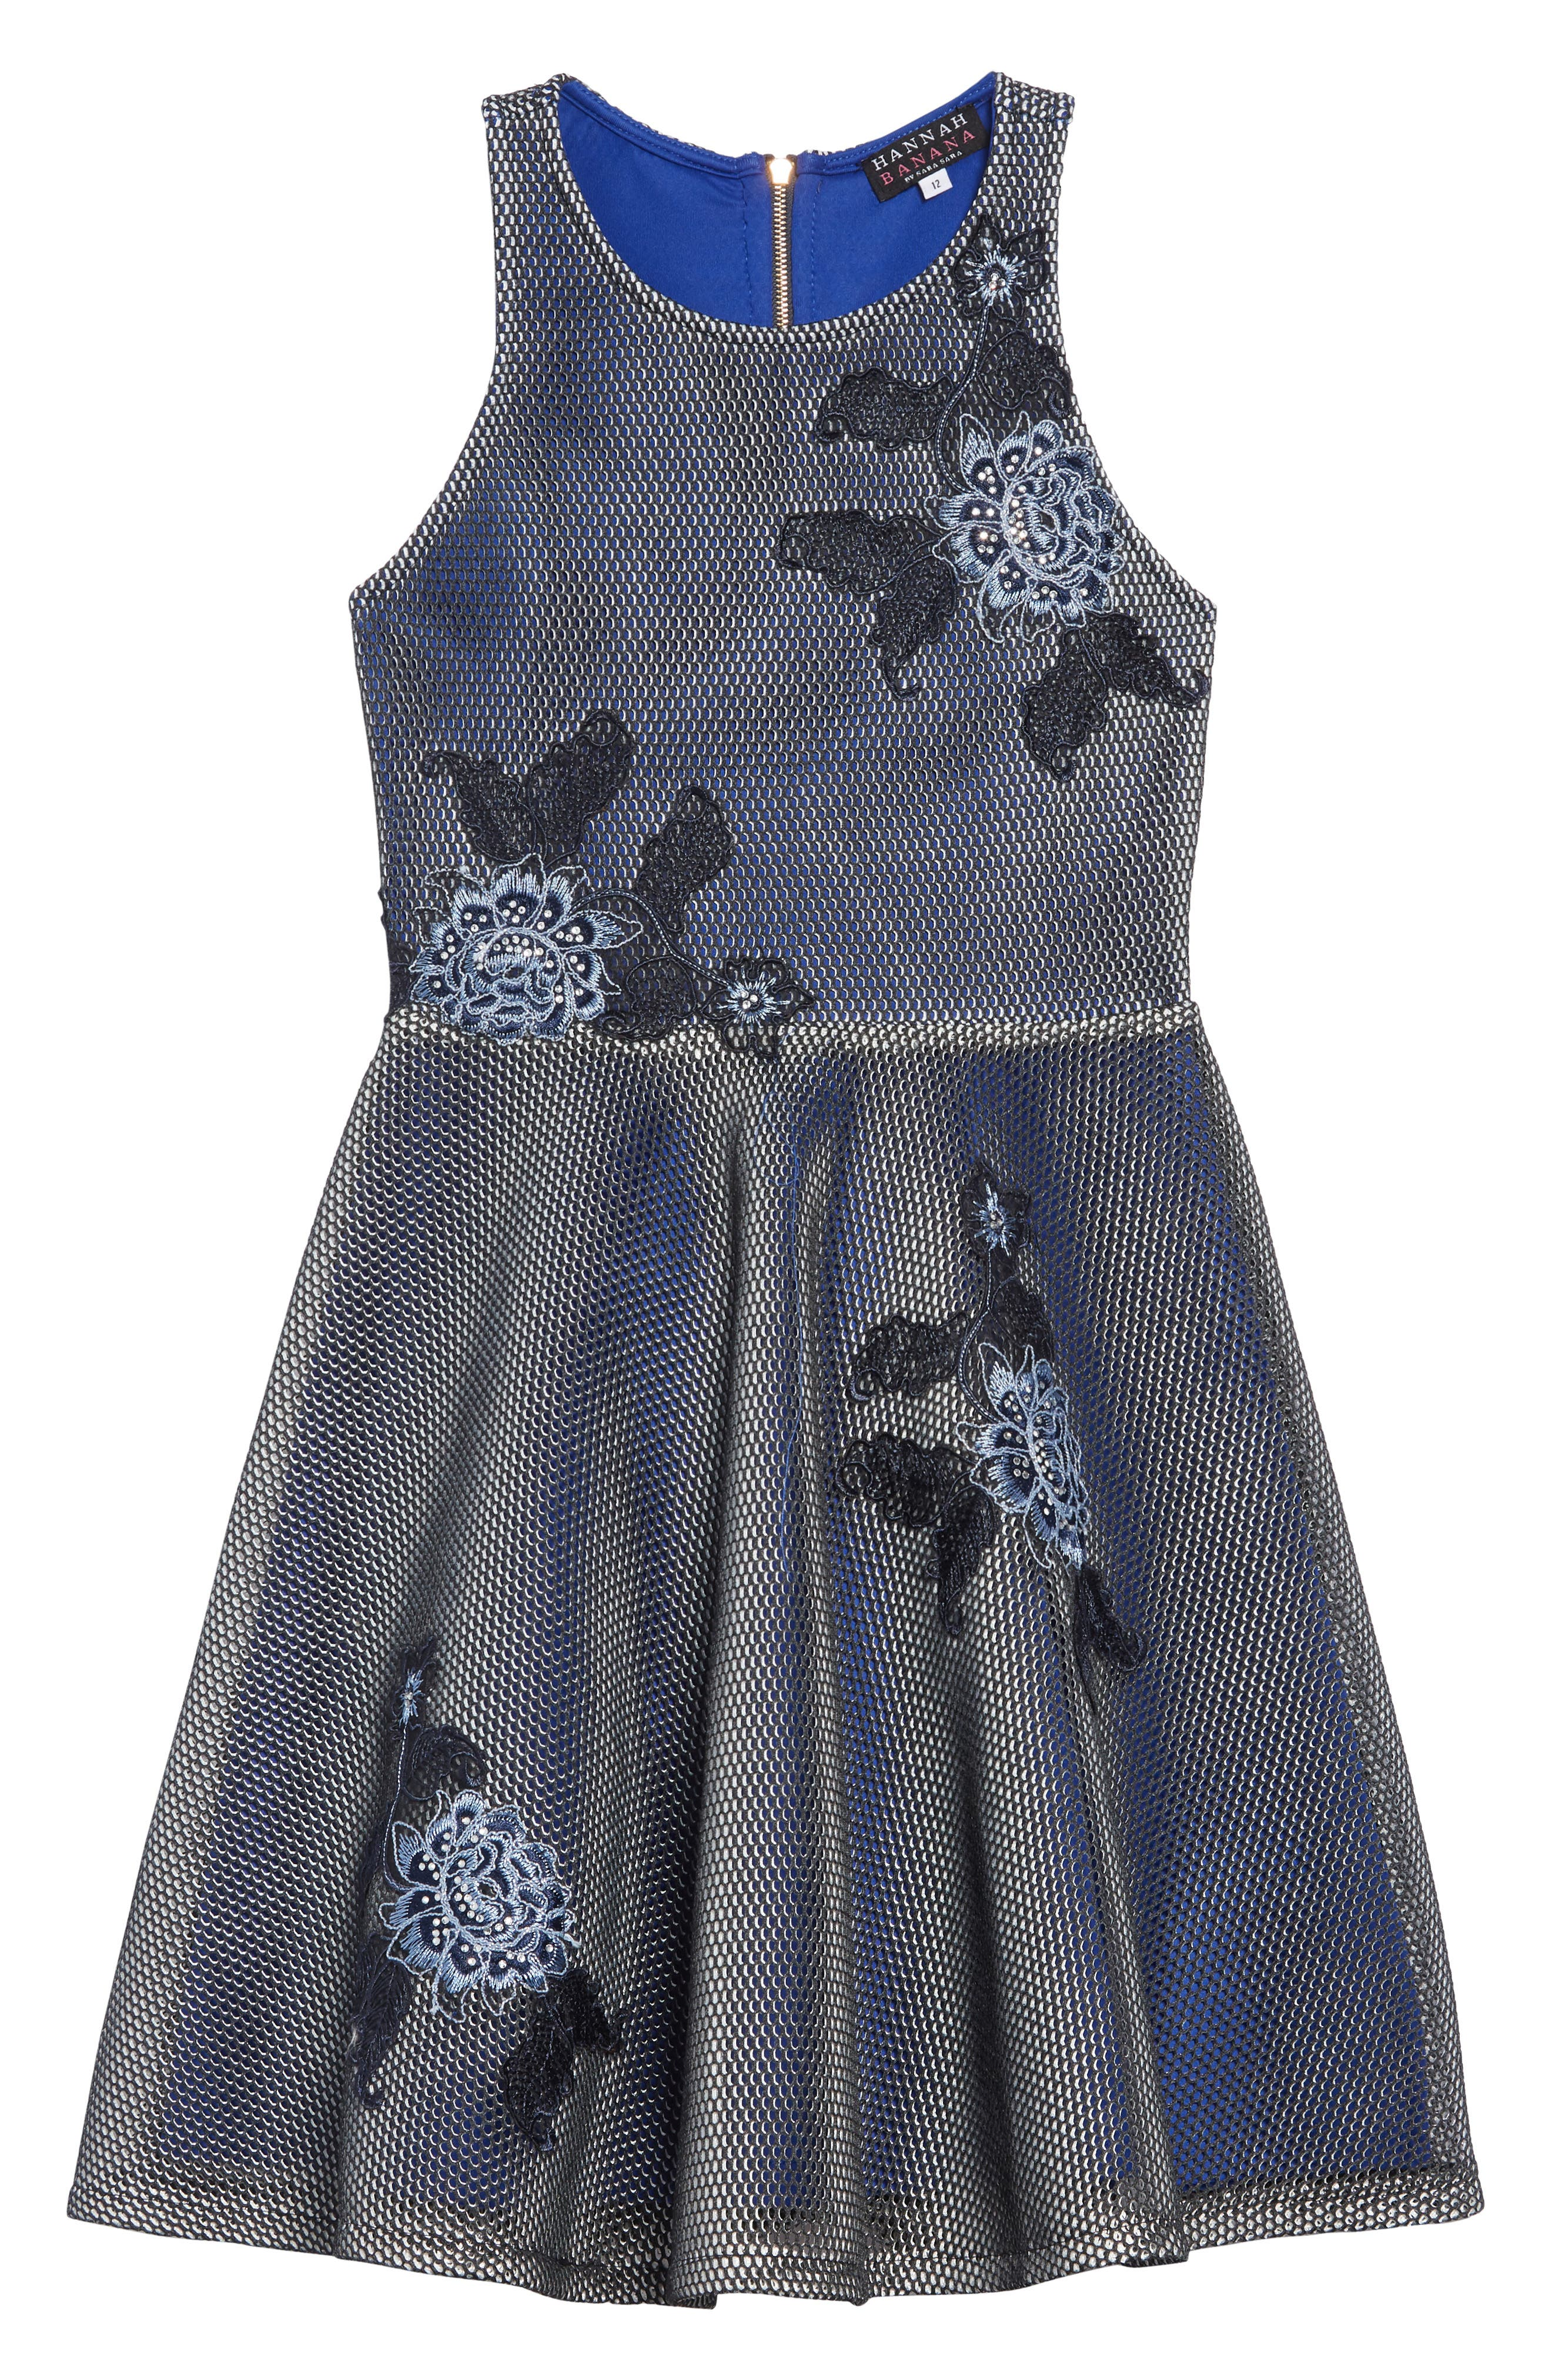 Embroidered Techno Mesh Dress,                             Main thumbnail 1, color,                             NAVY